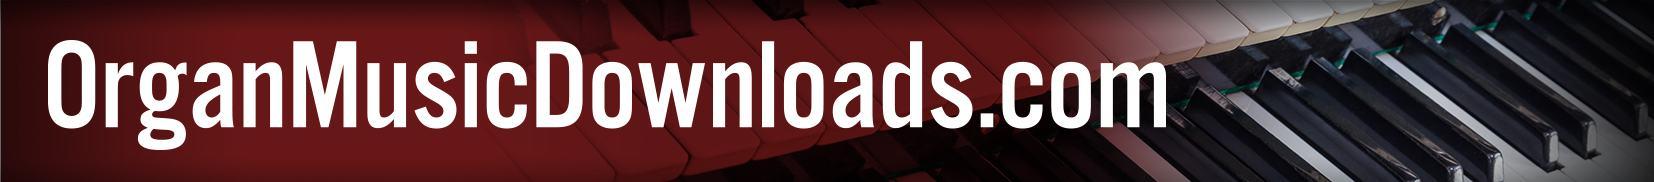 OrganMusicDownloads.com